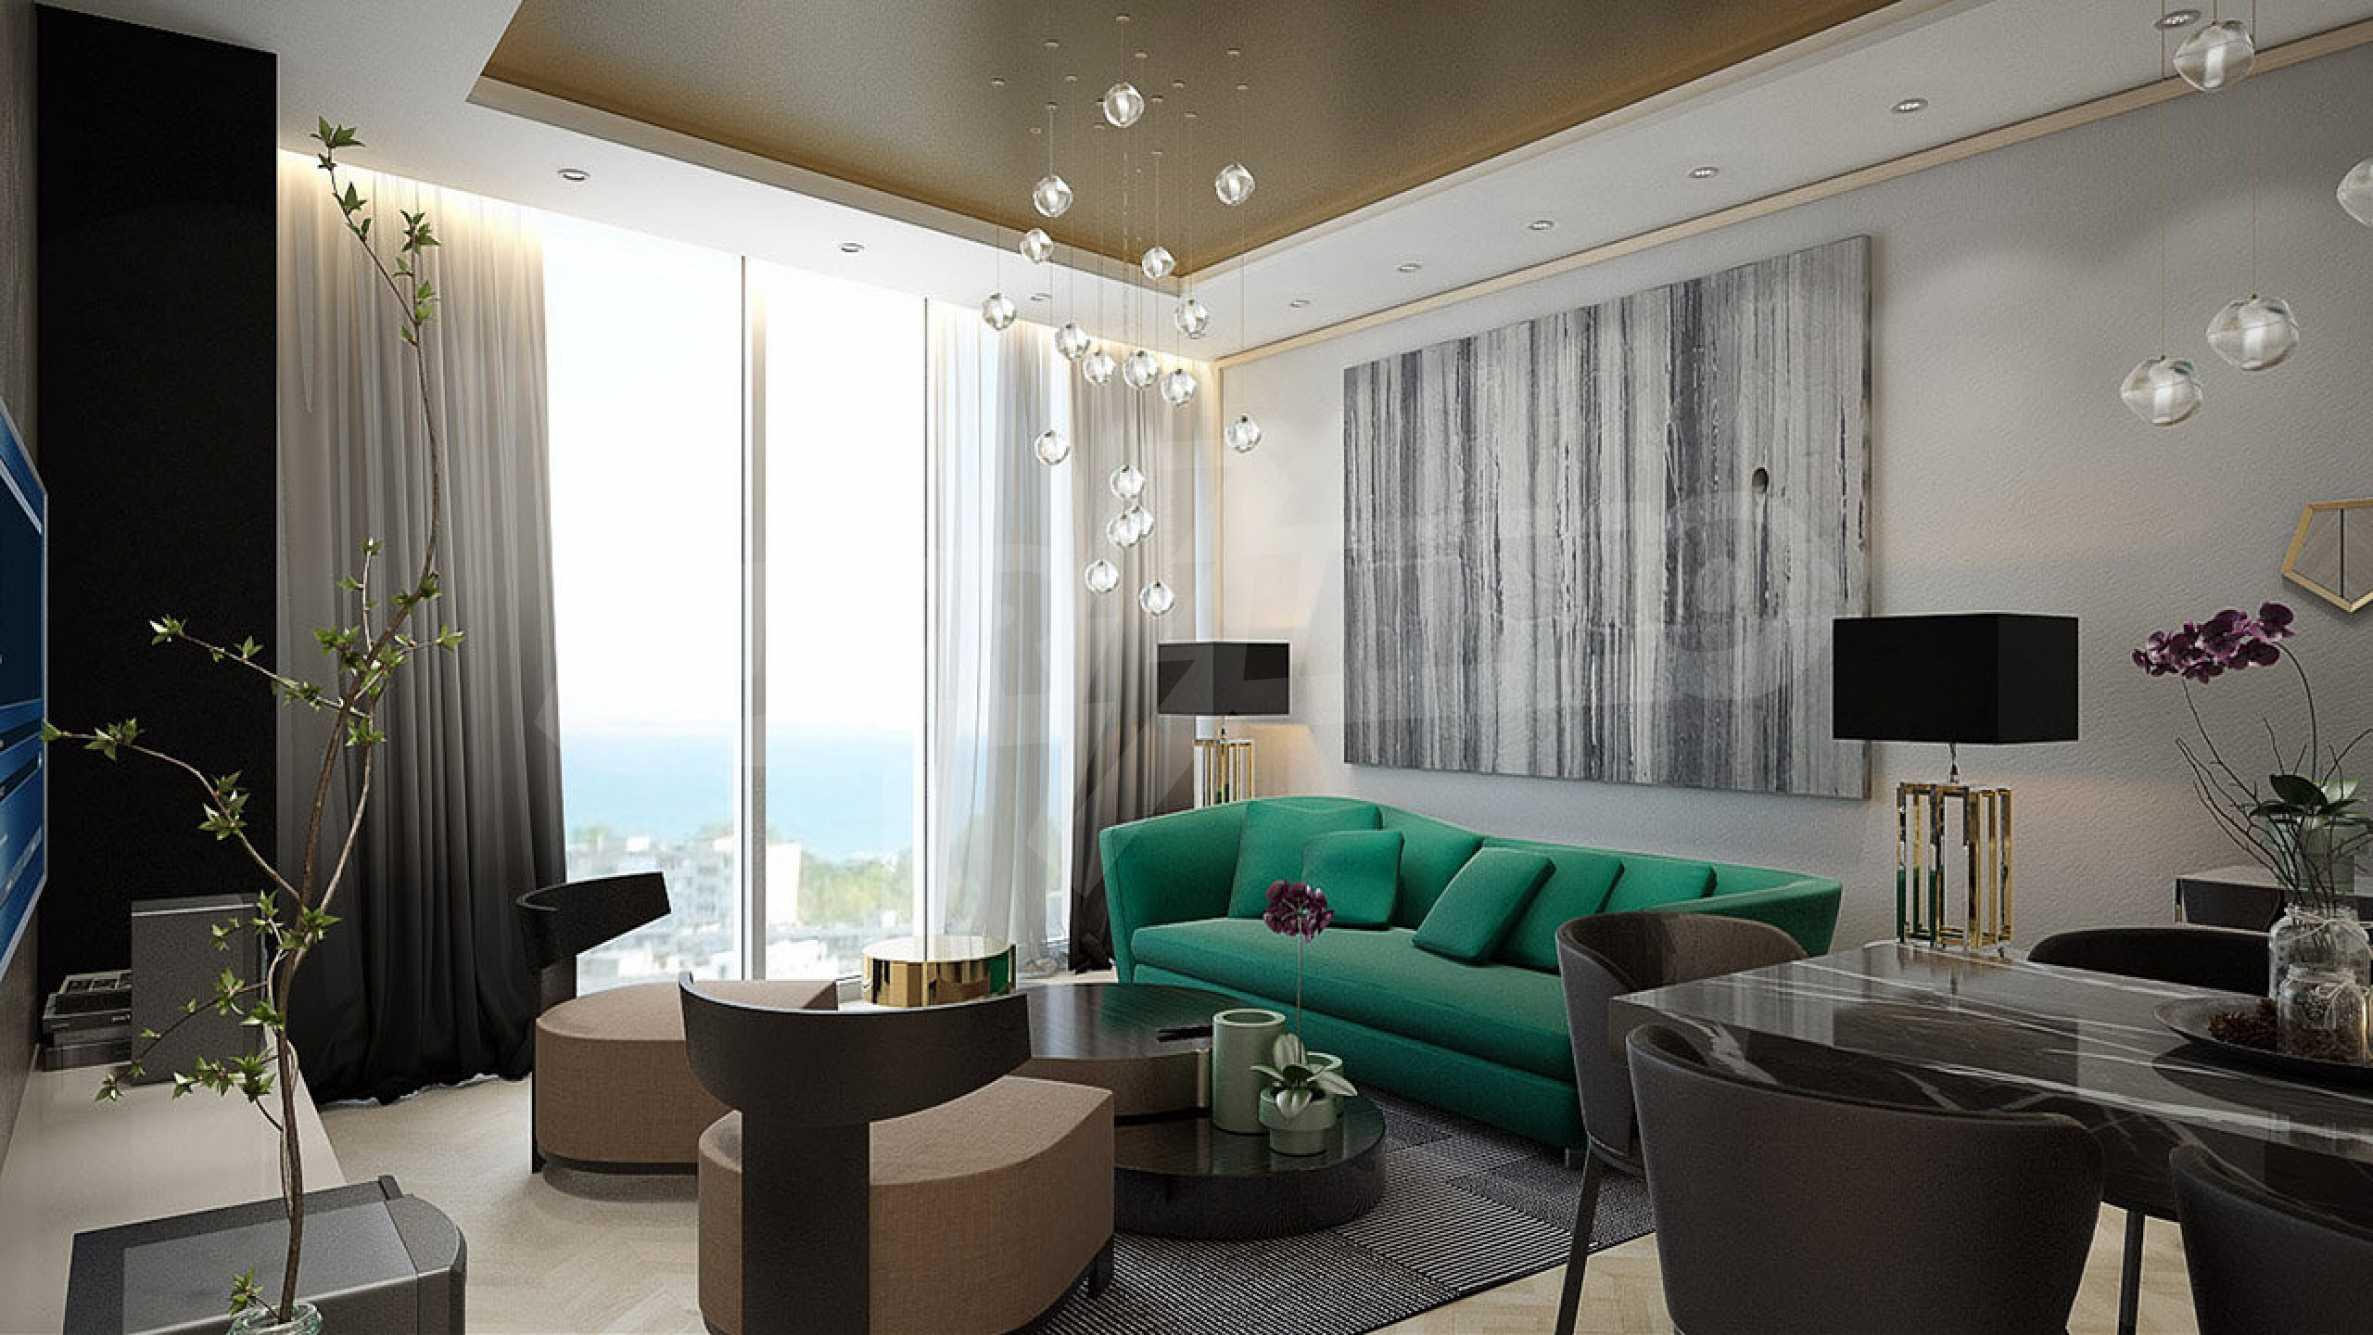 Нова сграда с луксозни апартаменти в гр. Бургас 44